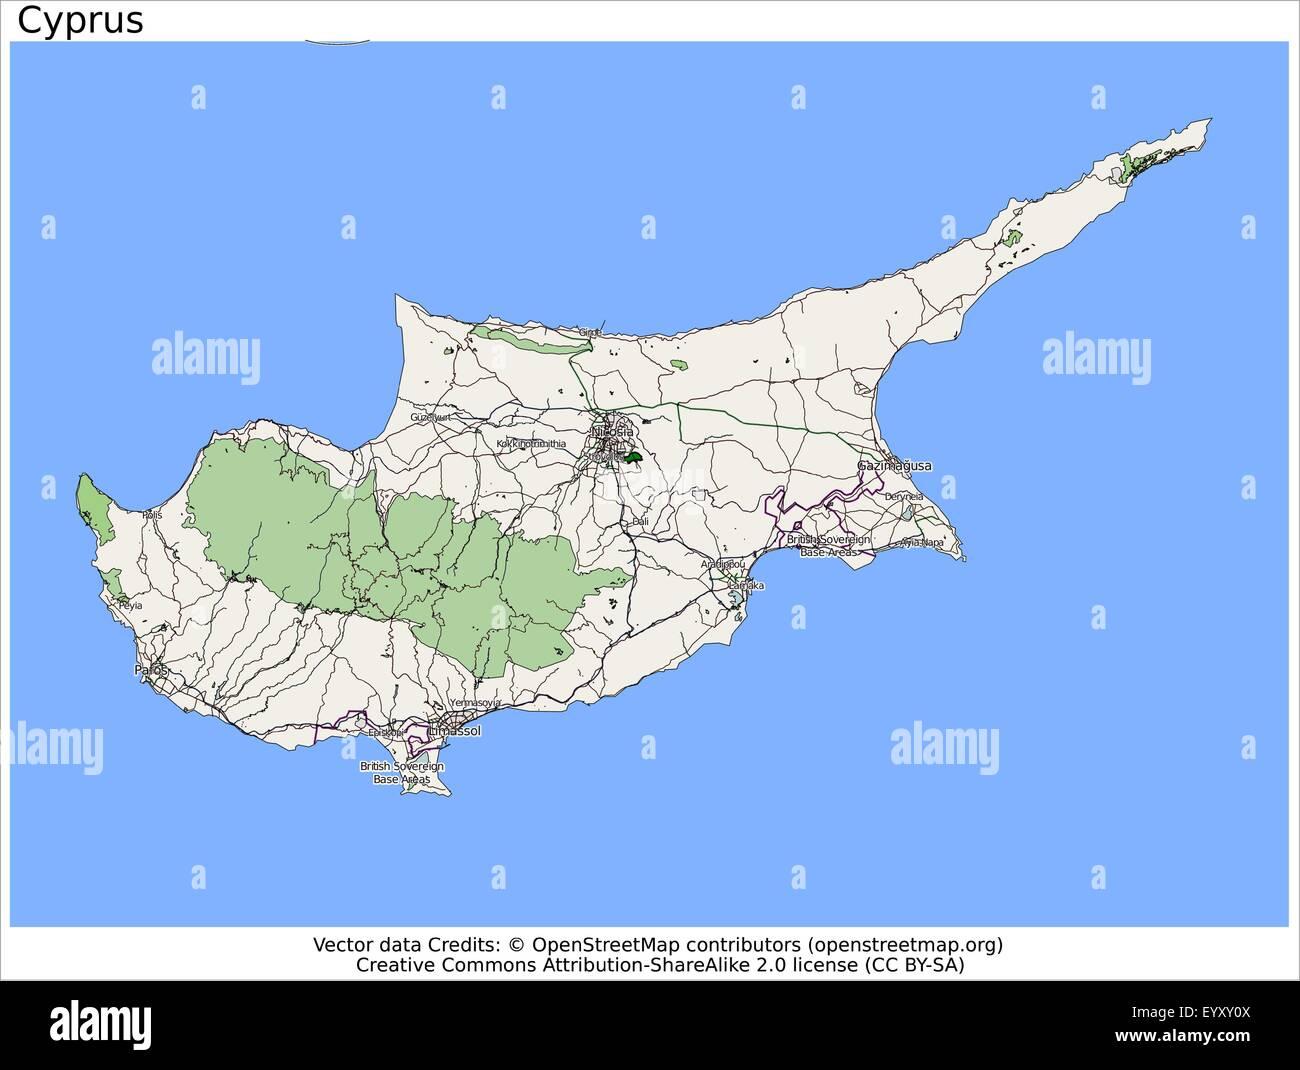 Cyprus island country city island state location map stock vector cyprus island country city island state location map gumiabroncs Image collections